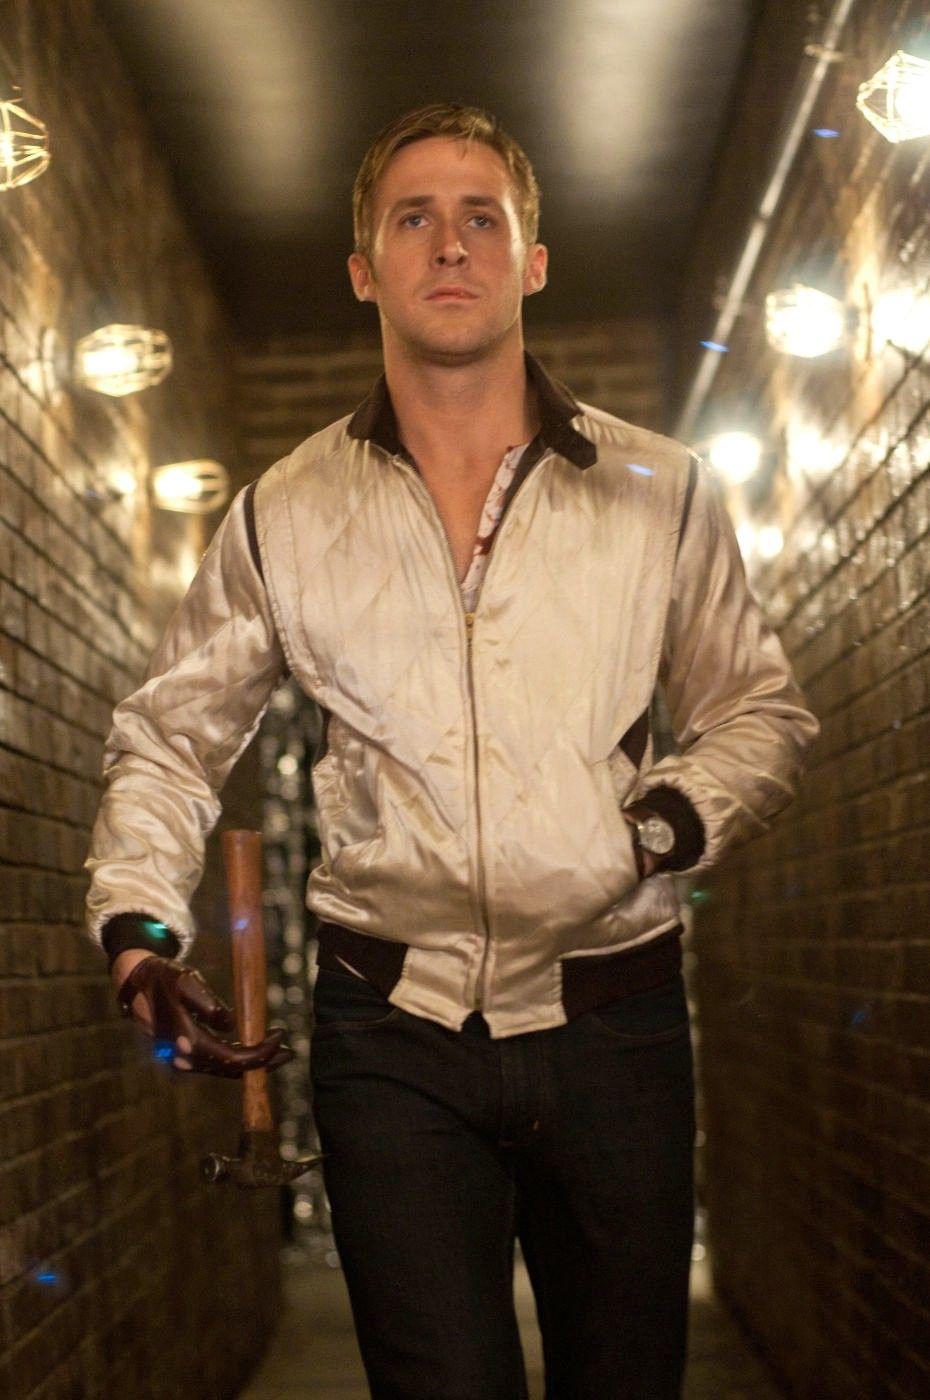 Pin By Kelly Bauml On Favourite Films Ryan Gosling Drive Hey Girl Ryan Gosling Ryan Gosling [ 1400 x 930 Pixel ]